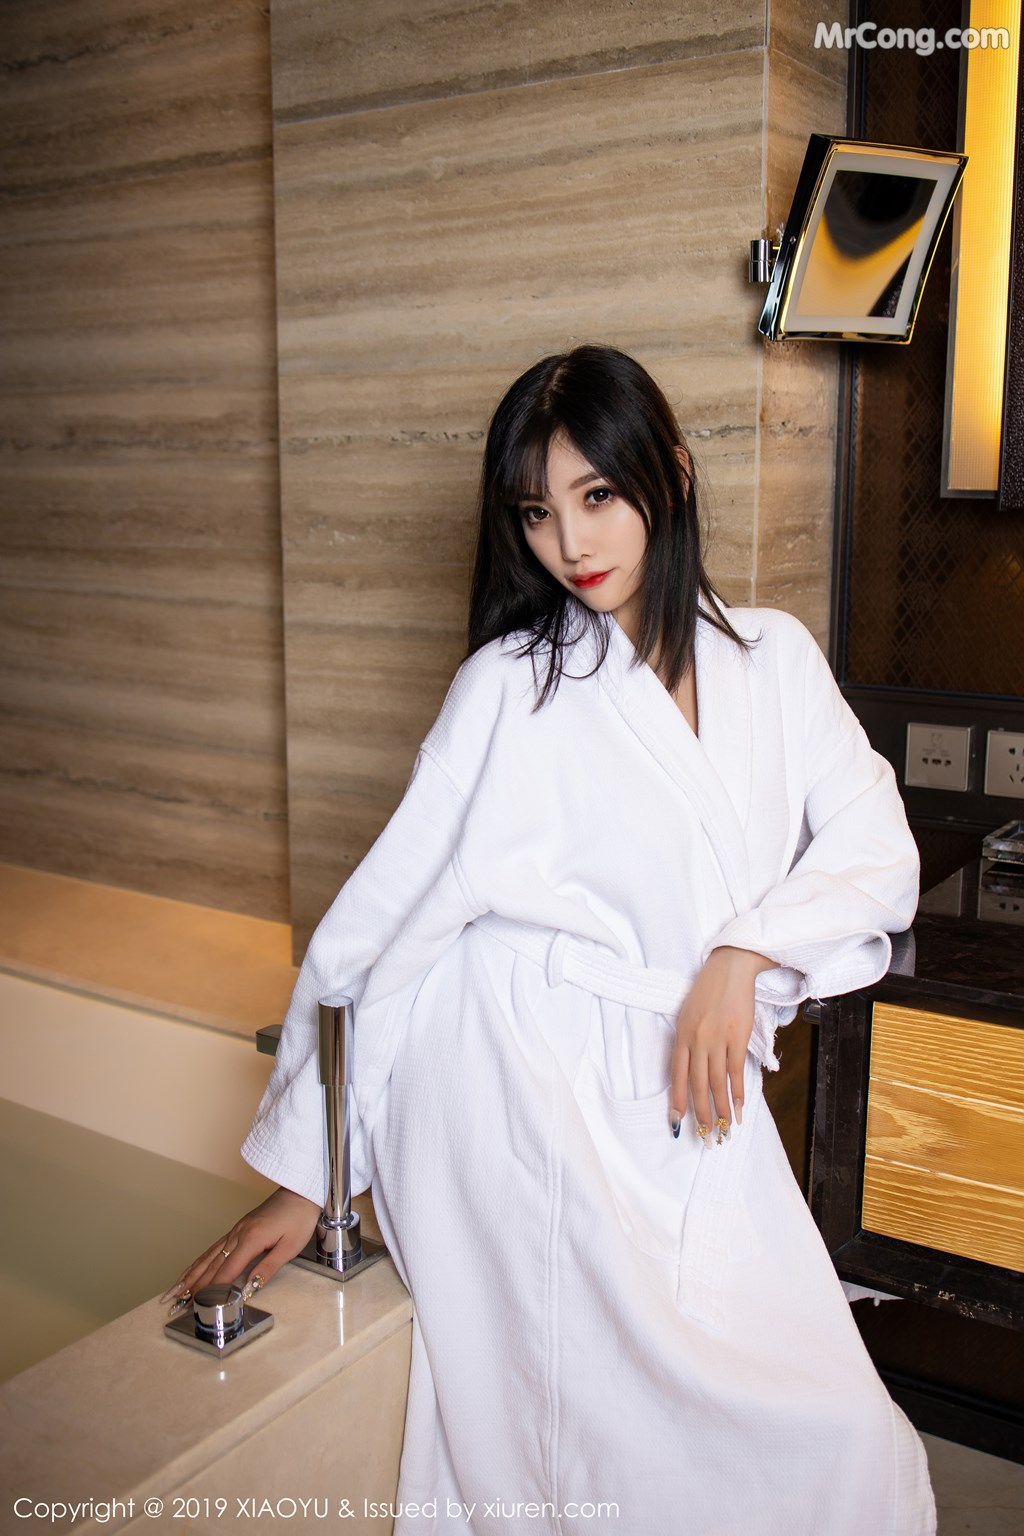 Image XiaoYu-Vol.153-Yang-Chen-Chen-sugar-MrCong.com-002 in post XiaoYu Vol.153: Yang Chen Chen (杨晨晨sugar) (81 ảnh)